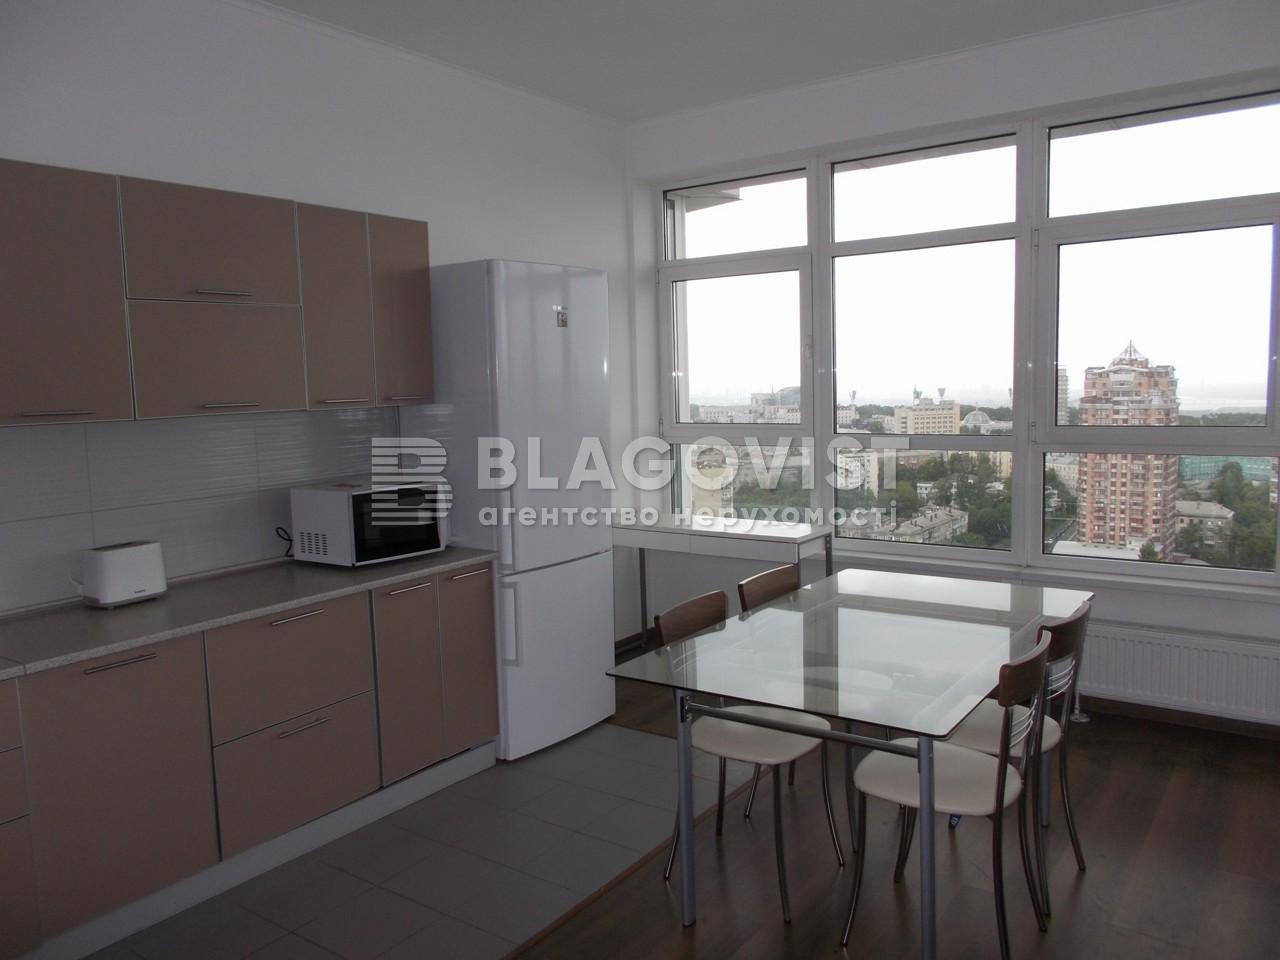 Офис, Кловский спуск, Киев, A-111150 - Фото 9